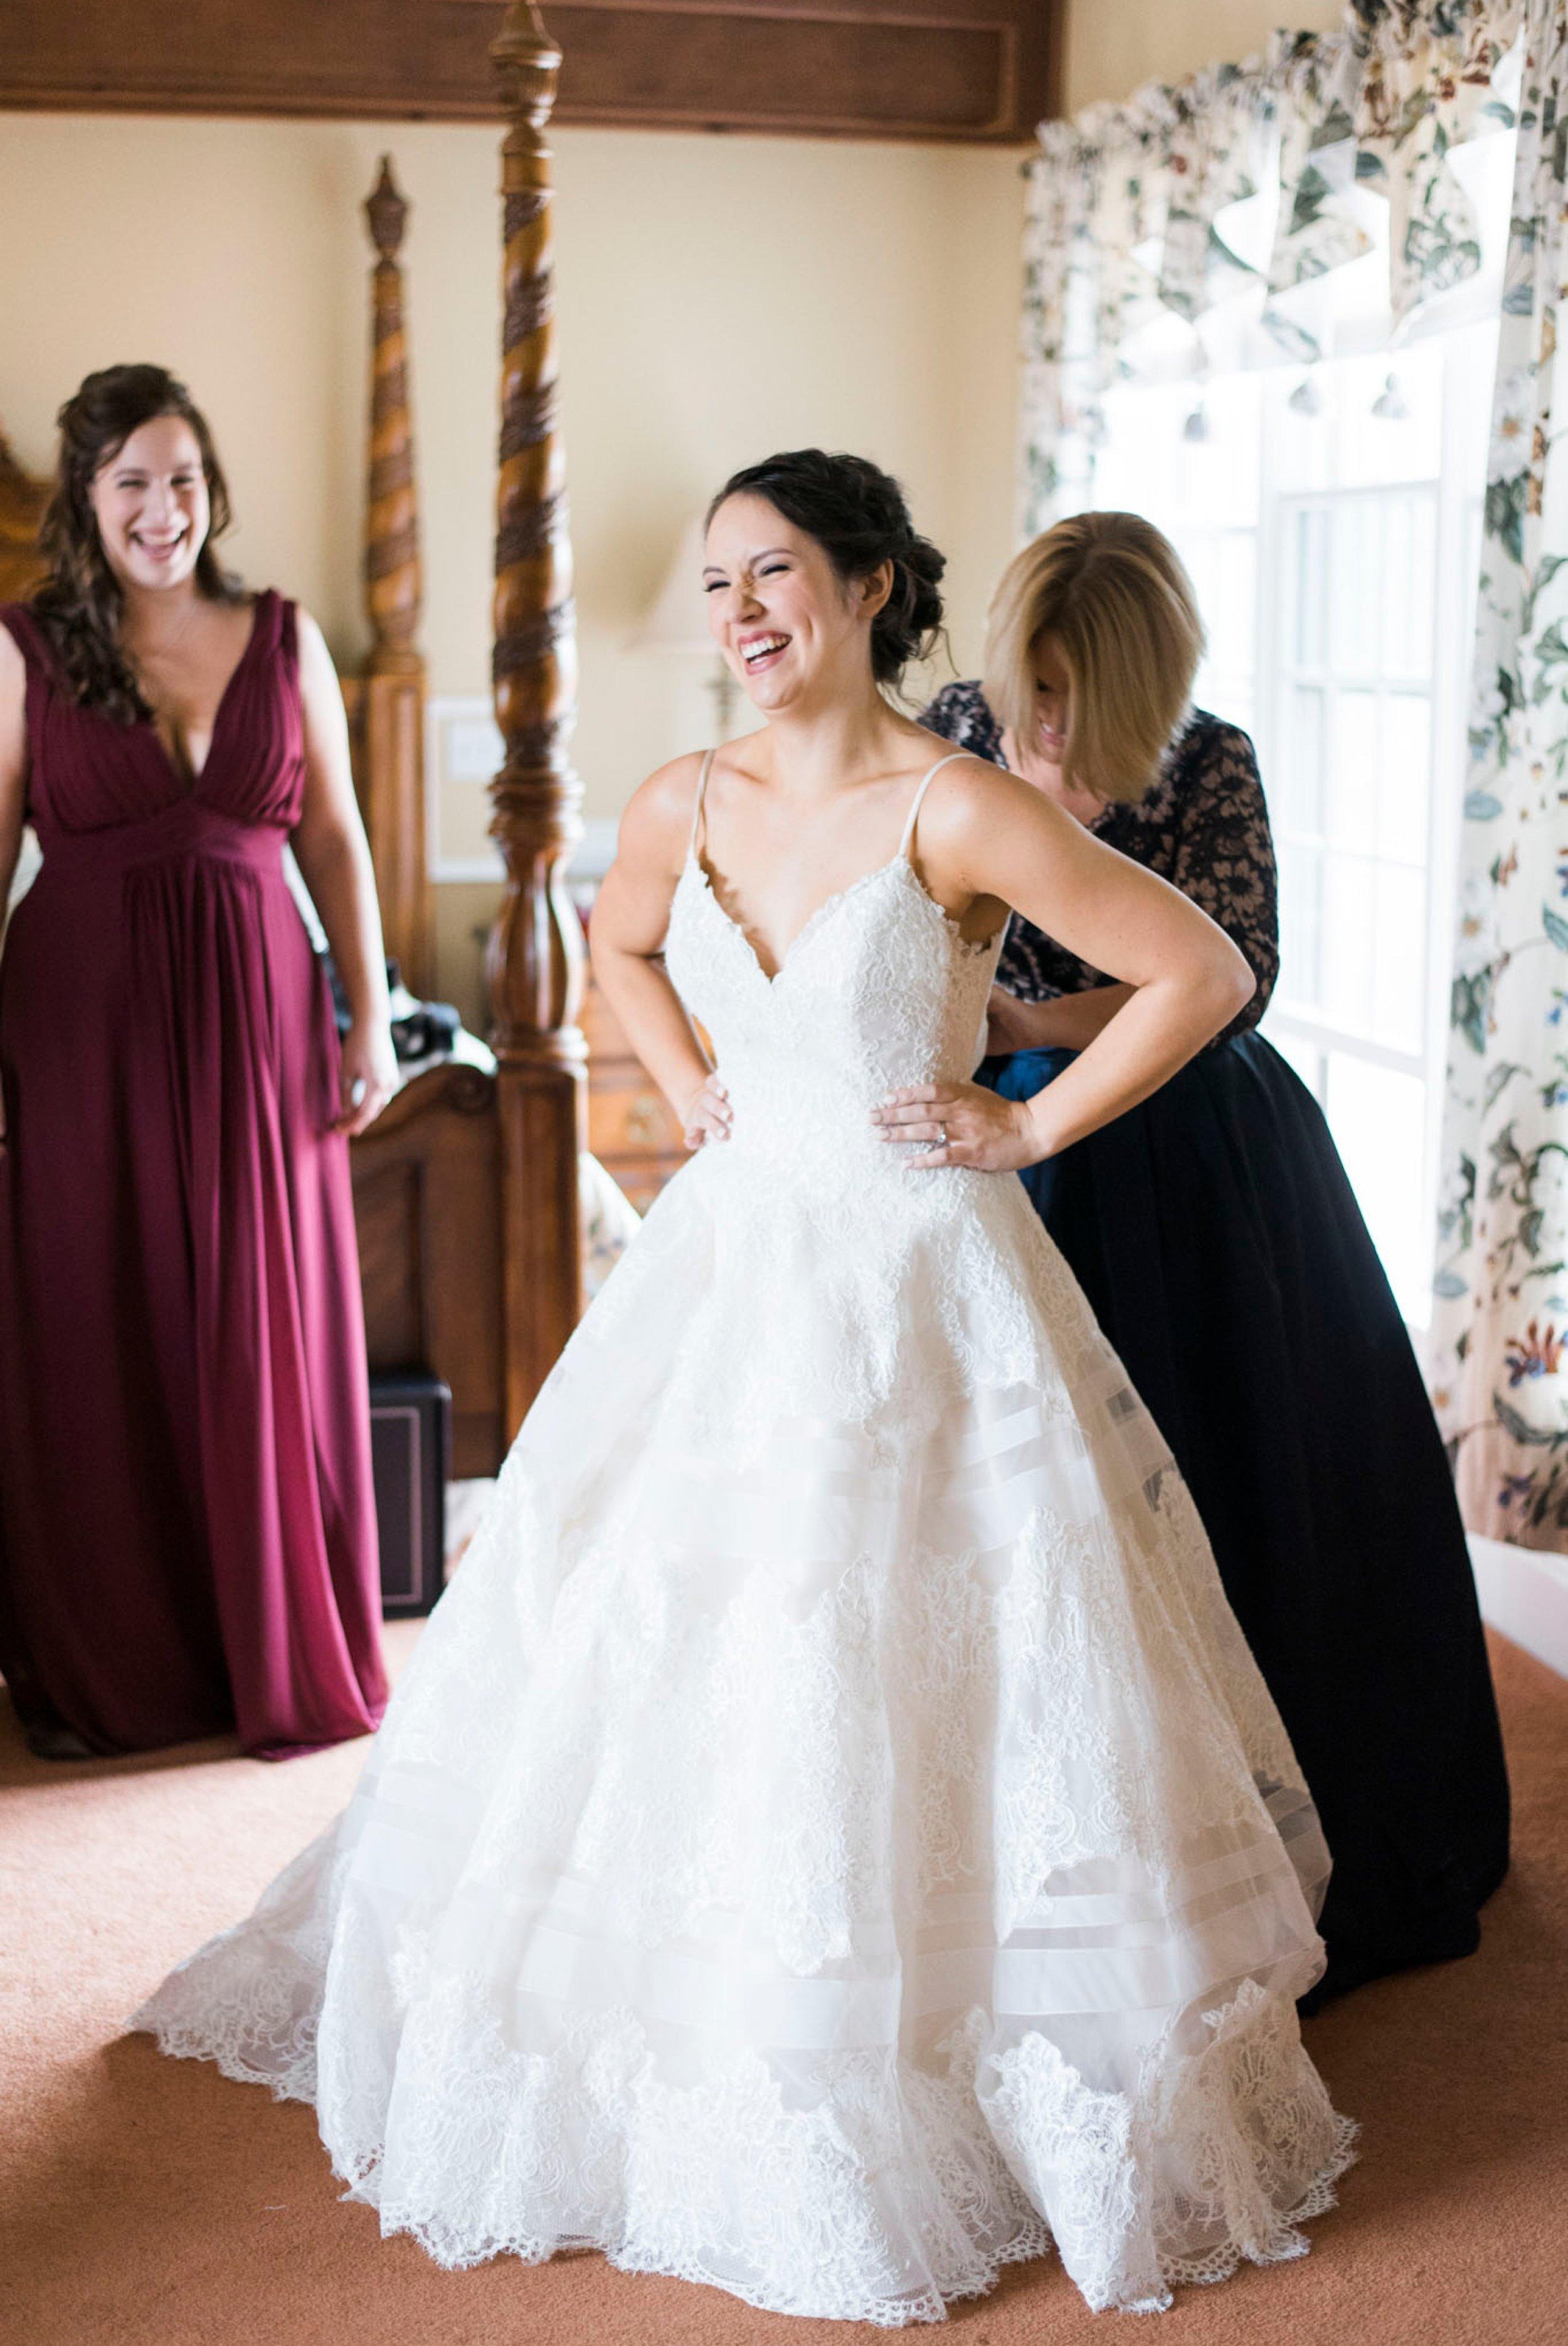 IrvineEstate_LexingtonVA_Wedding_FallWedding_VirginiaWeddingPhotographer 11.jpg